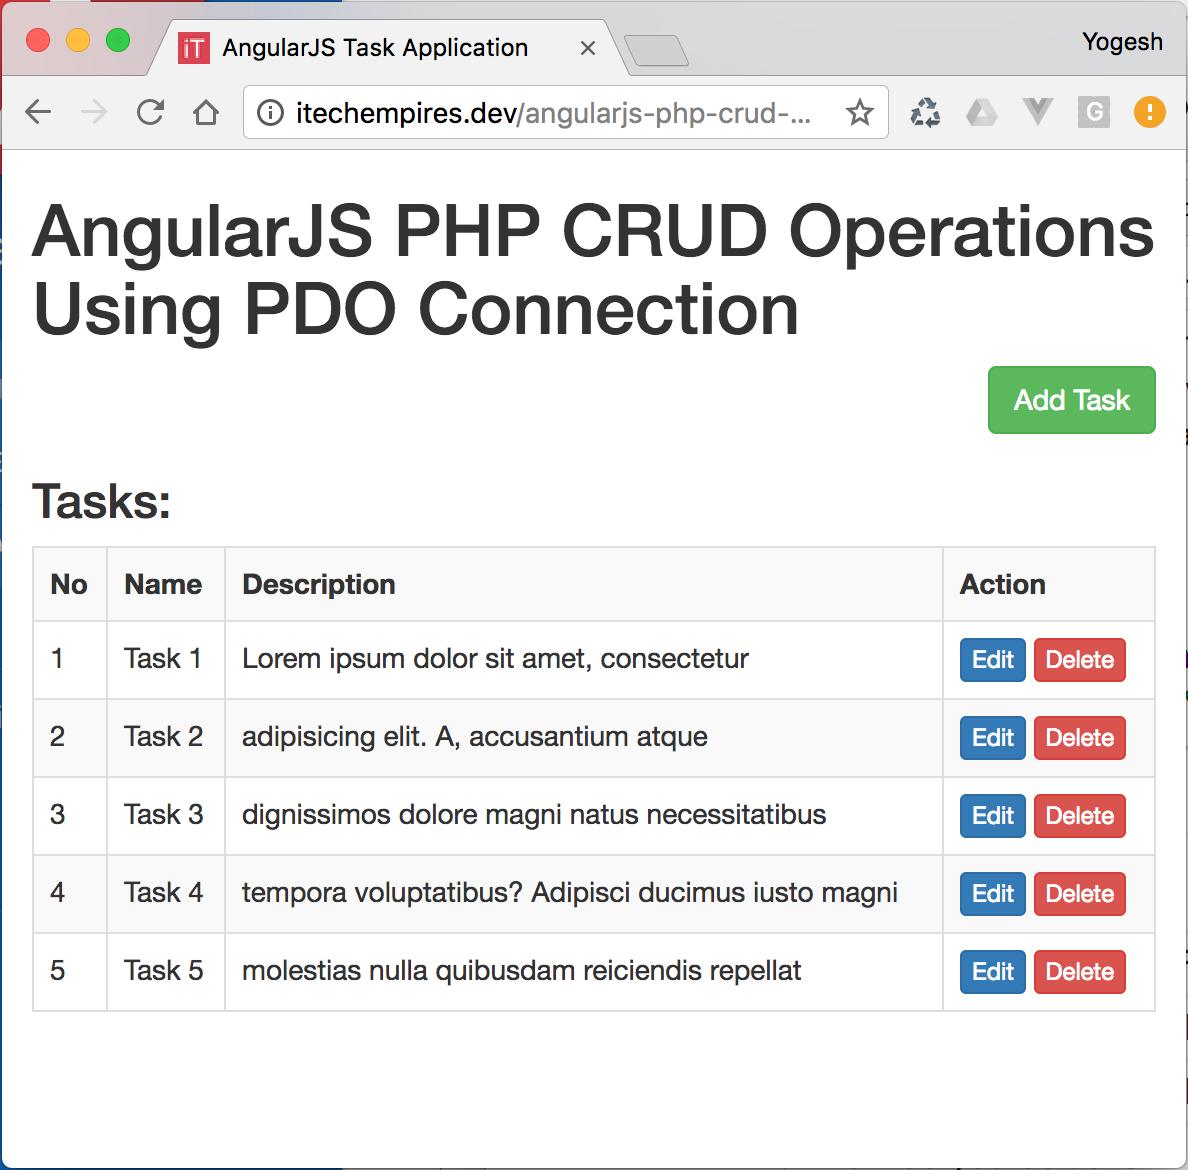 AngularJS PHP CRUD (Create, Read, Update, Delete) Operations